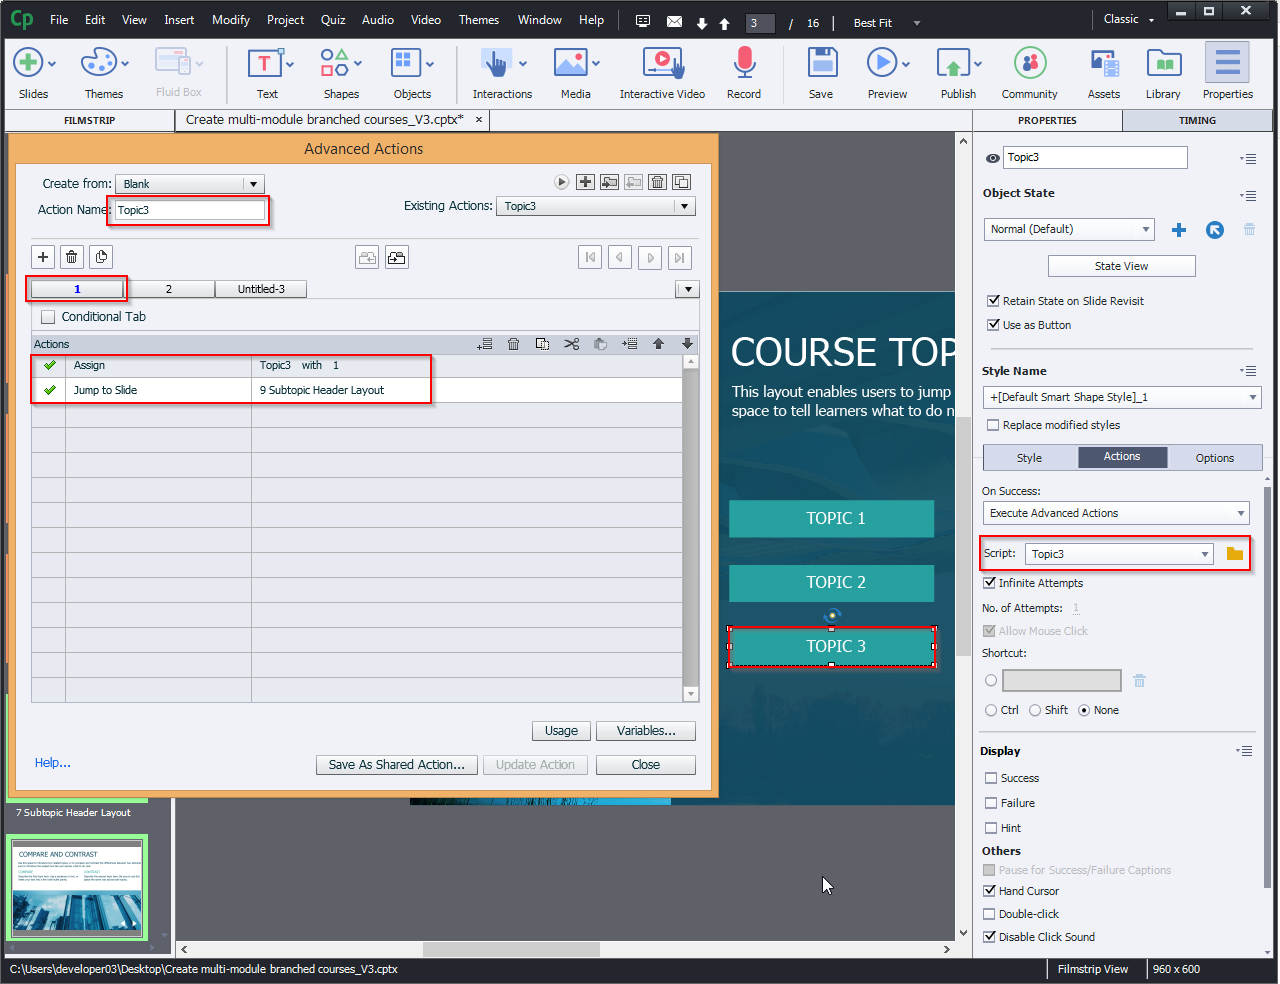 Create multi-module branched courses 10.6